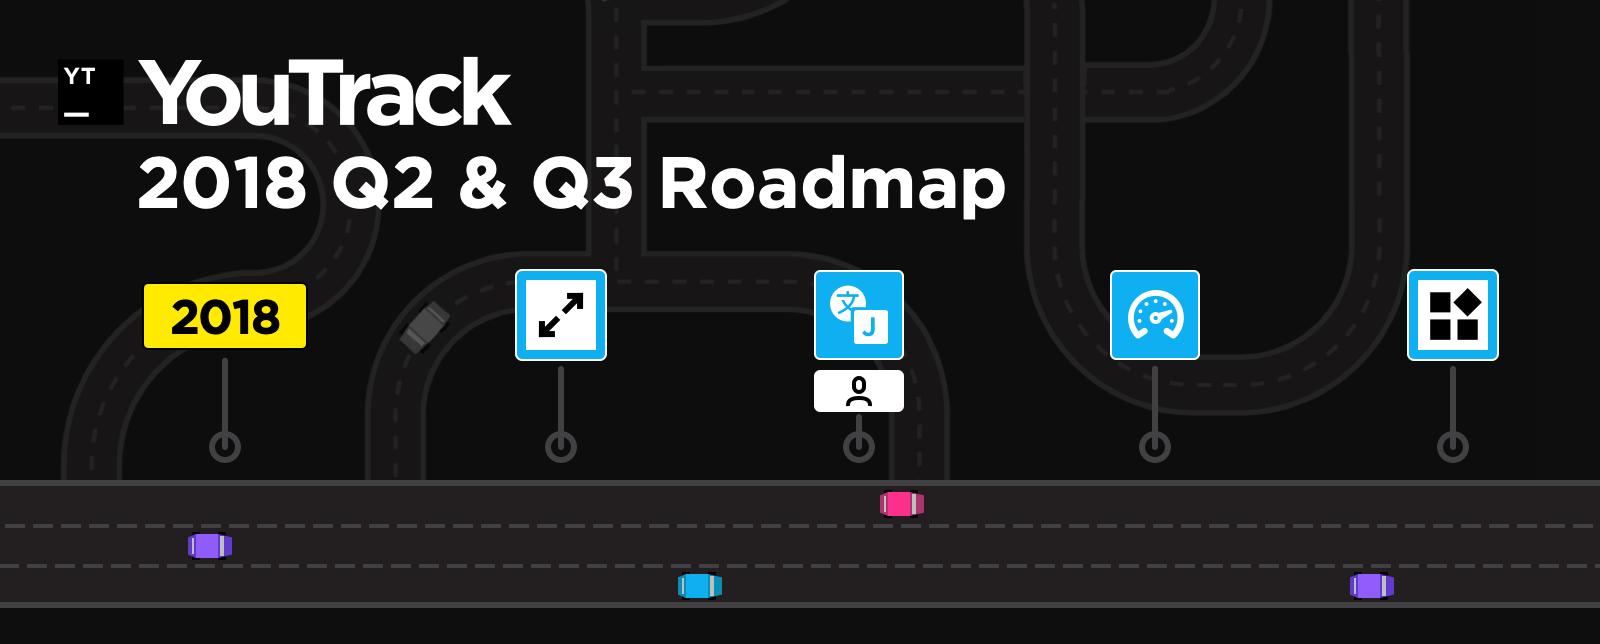 2018 Roadmap@2x